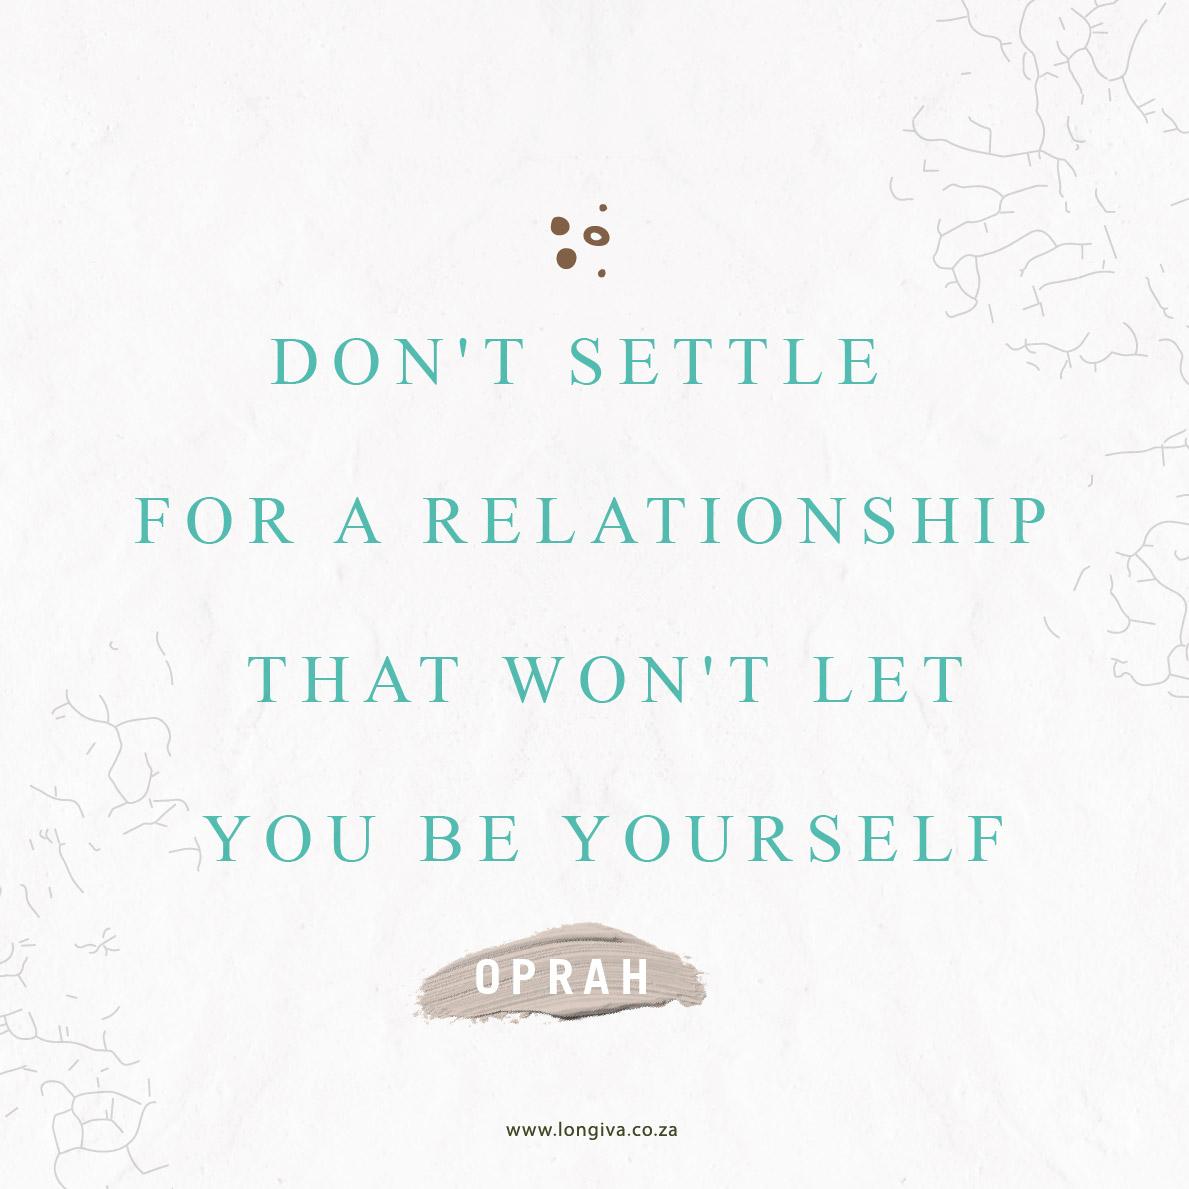 Don't settle for a relationship that won't let you be yourself - Oprah  #LongivaSA #Longiva#Aesthetics #IntegrativeMedicine #DrGys#health #motivation #beautiful#inspirational #motivational #fashion #guy#beauty #picoftheday #weightloss #amazing #women ...